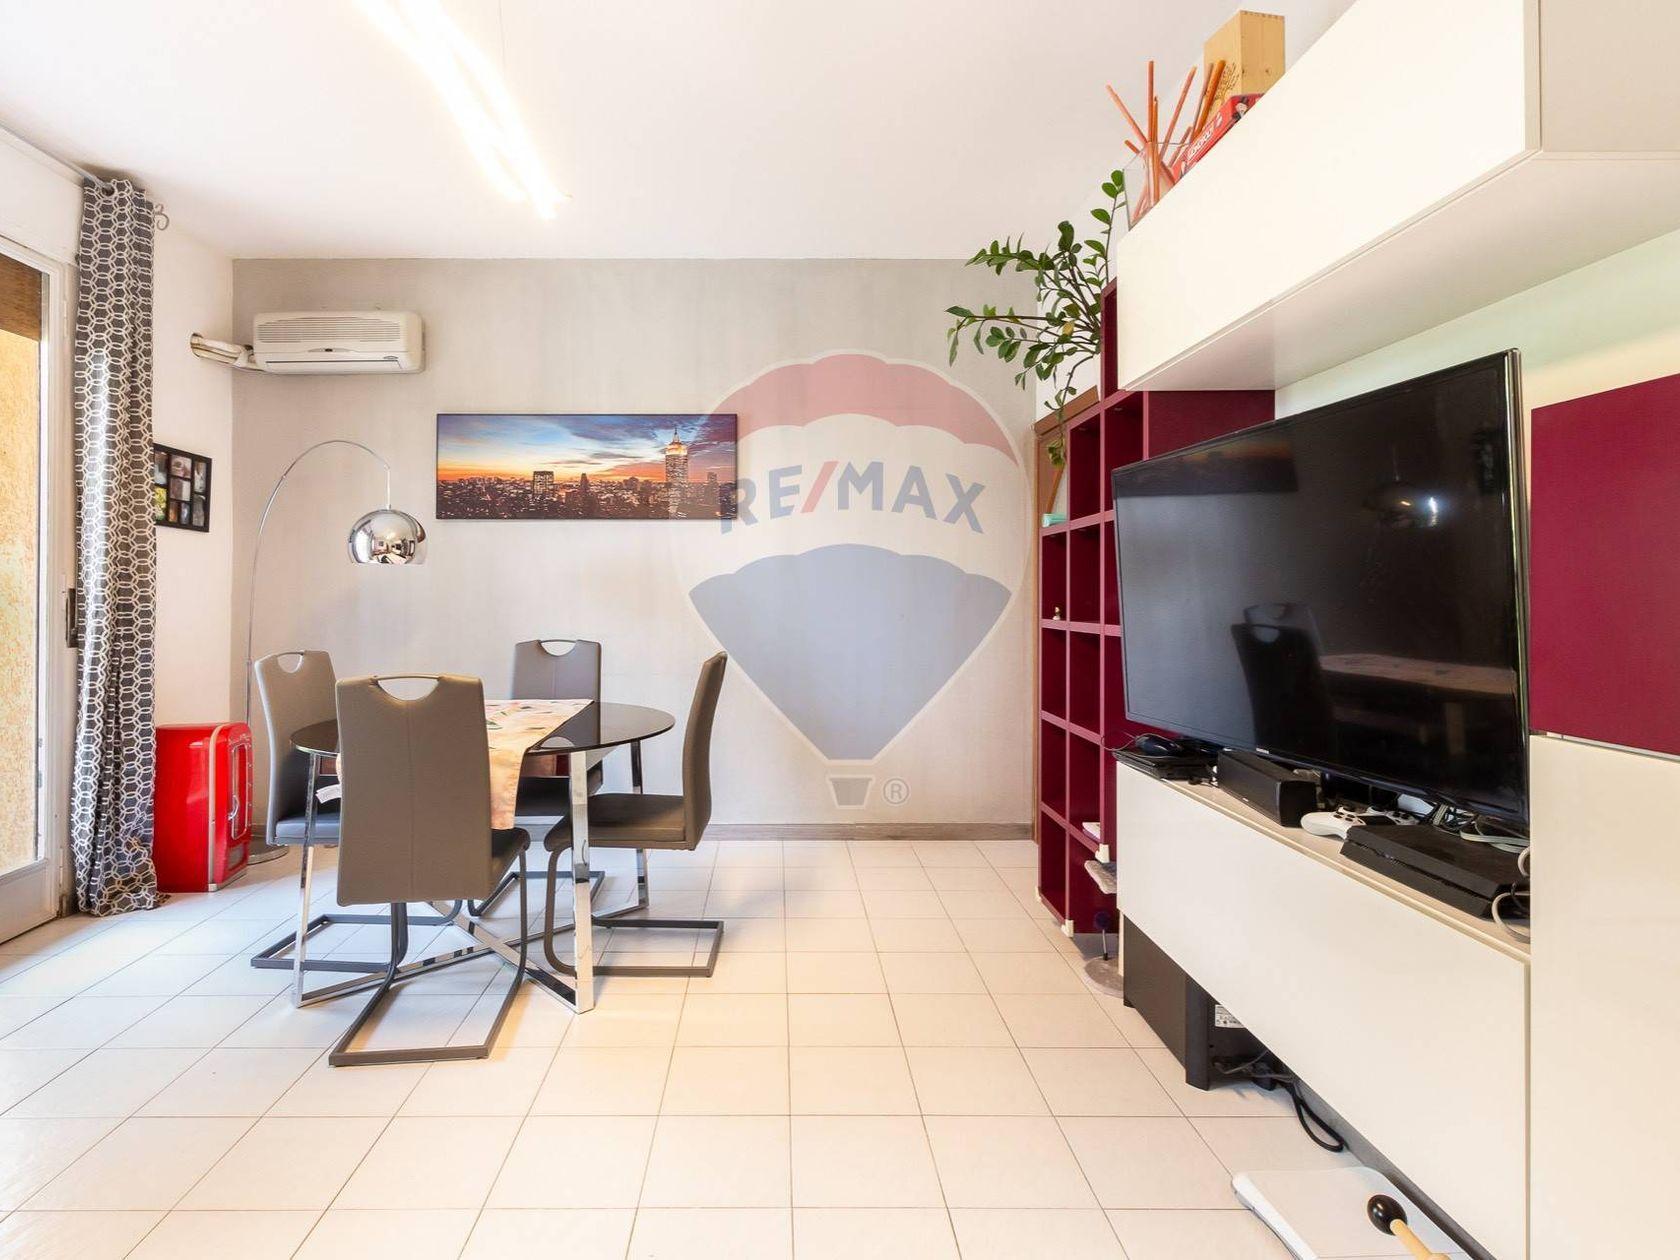 Appartamento Milano-certosa Quarto Oggiaro Villapizzone, Milano, MI Vendita - Foto 19